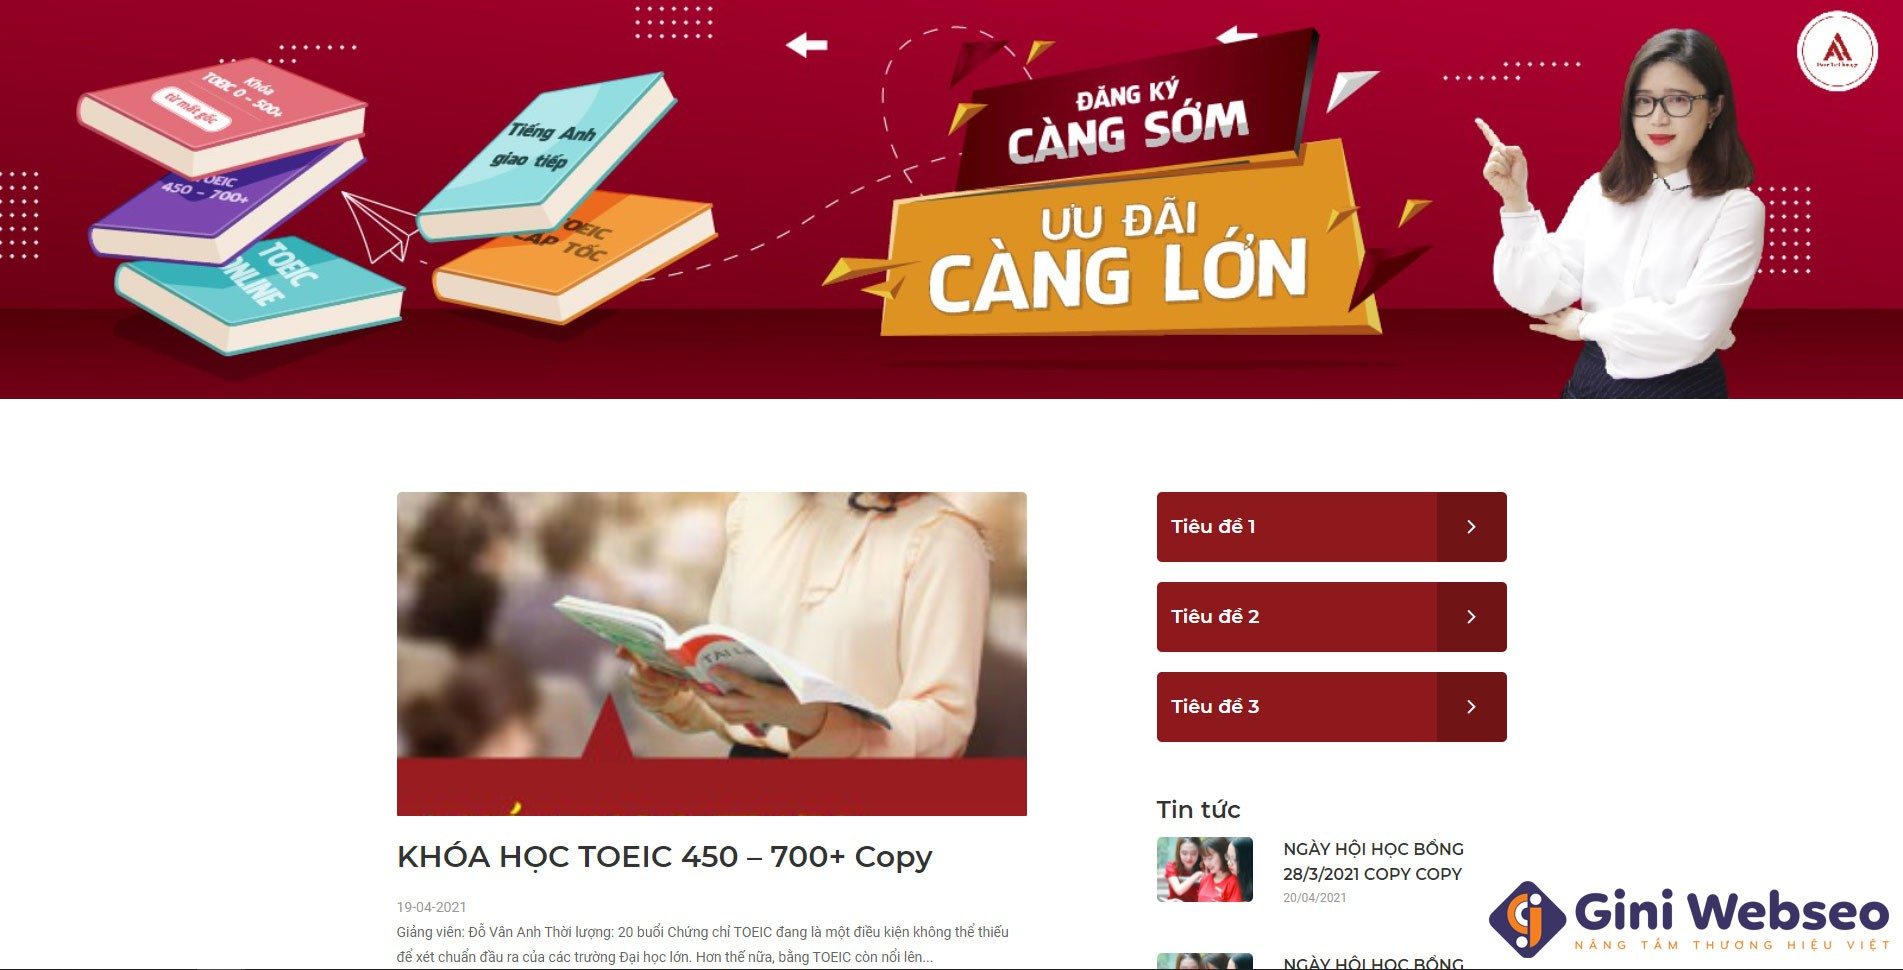 Thiết kế website trung tâm tiếng Anh ATHENA